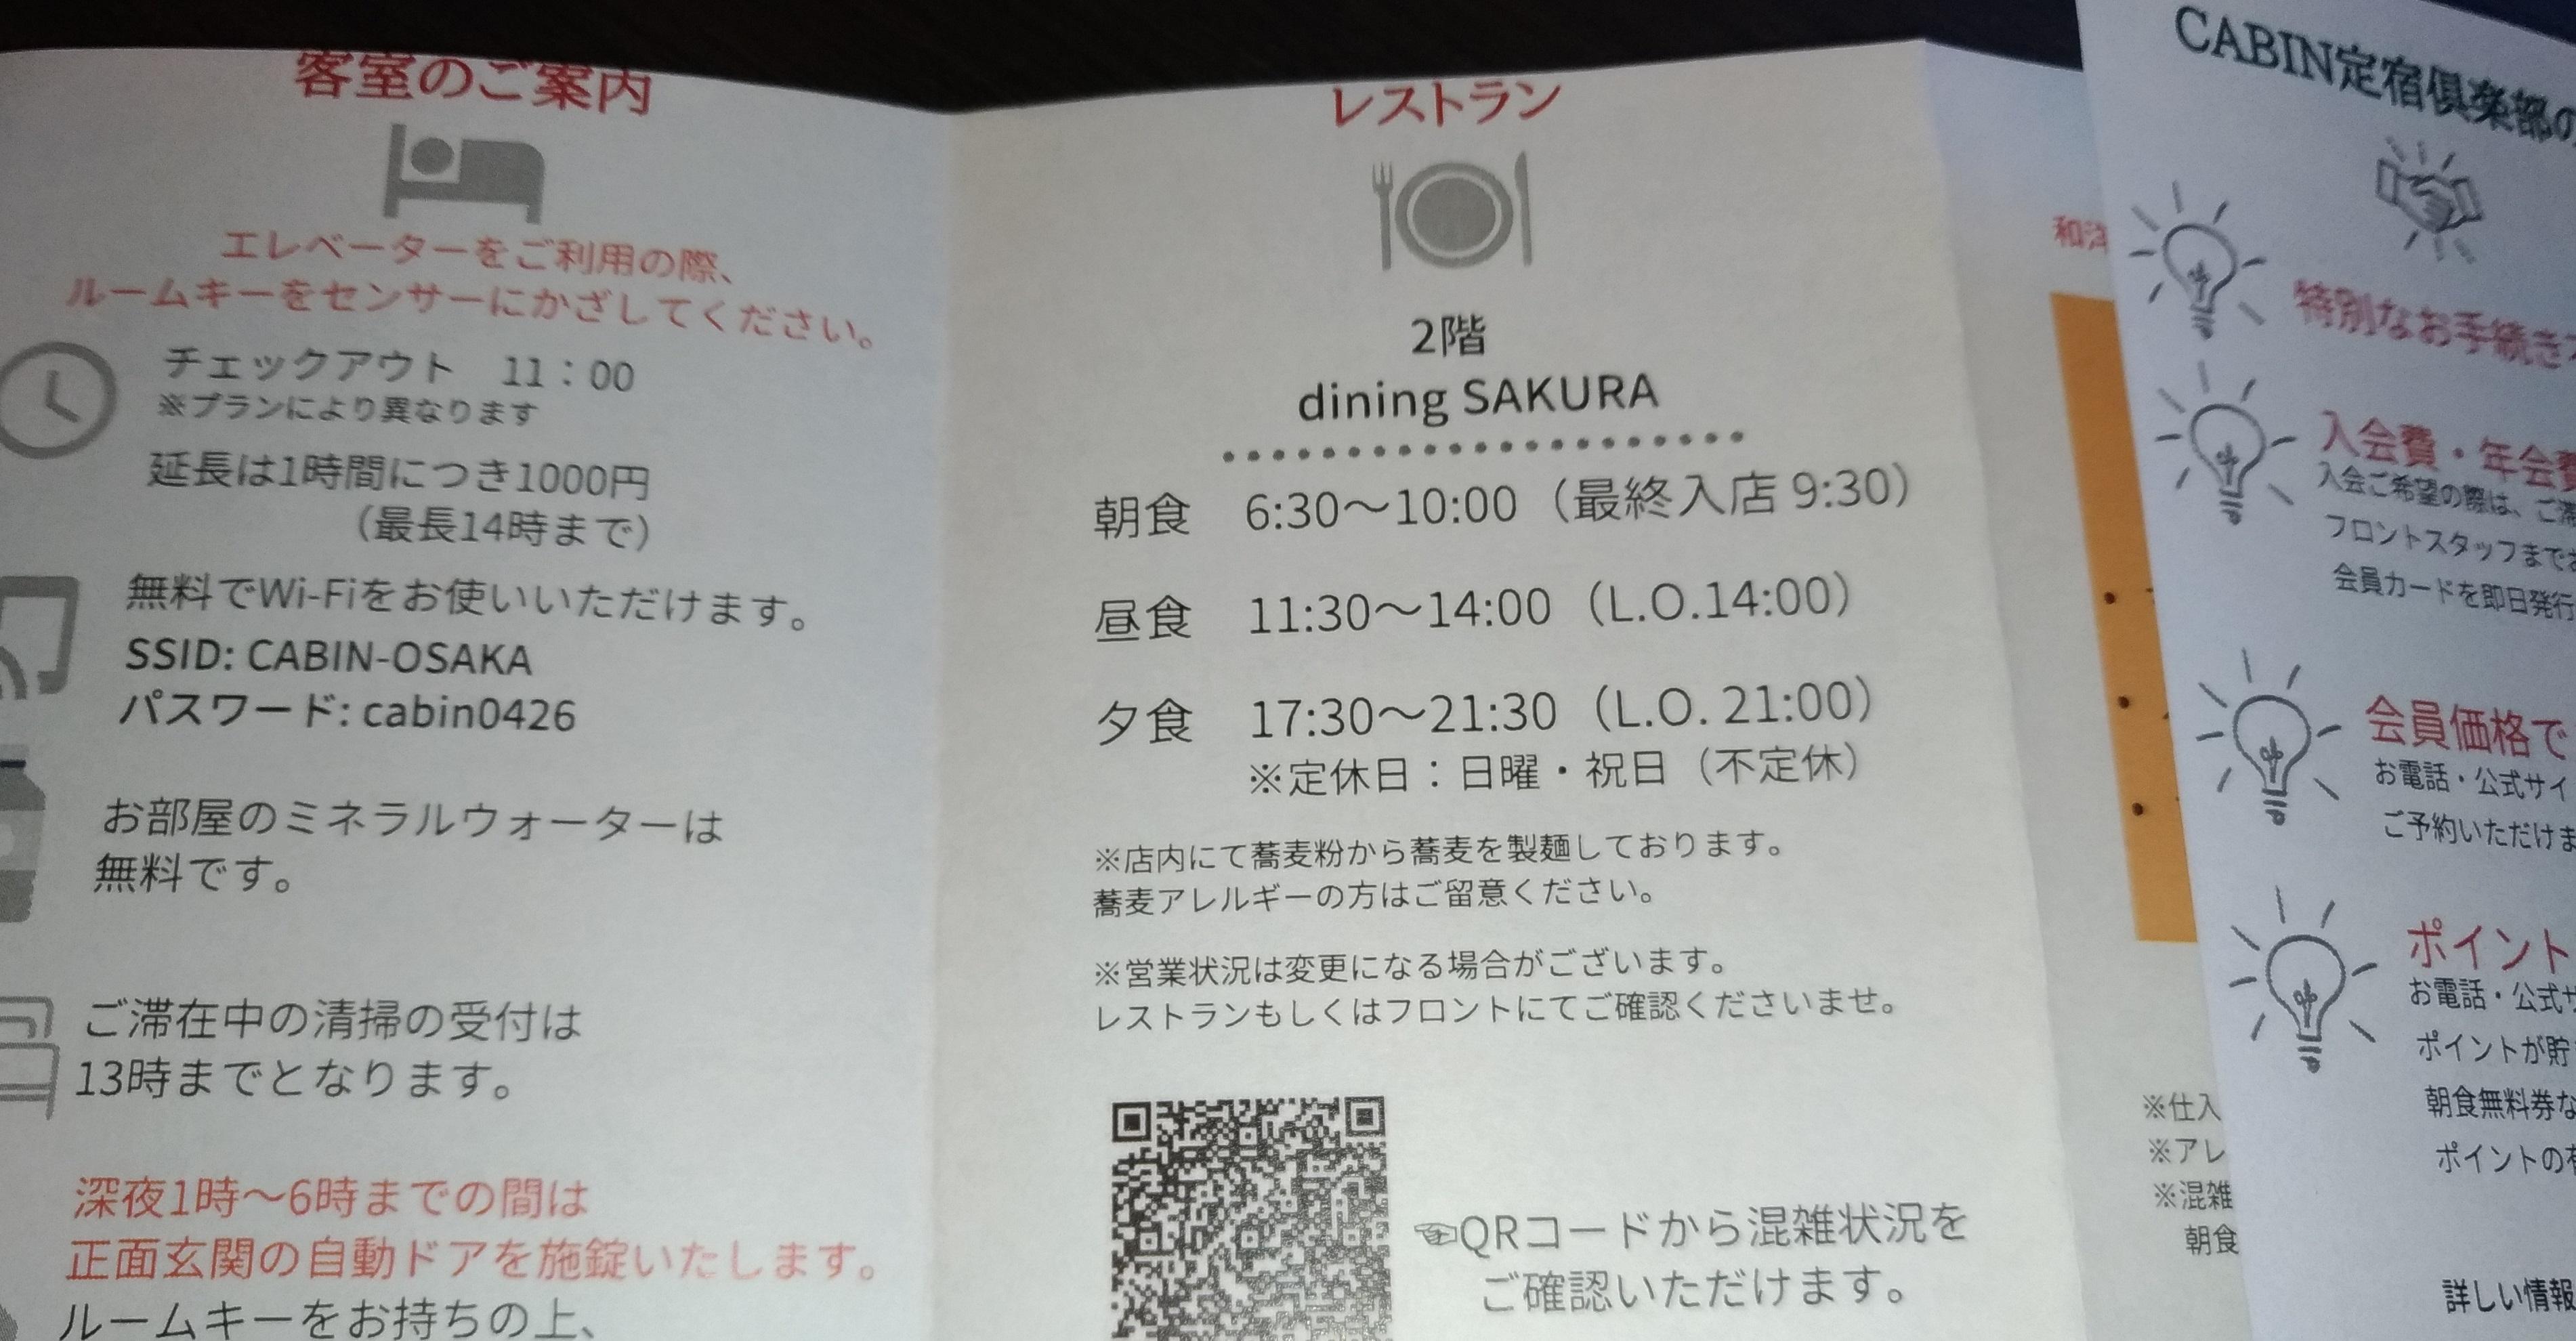 osaka_hotel_cabin_minamimorimachi_1023_3.jpg